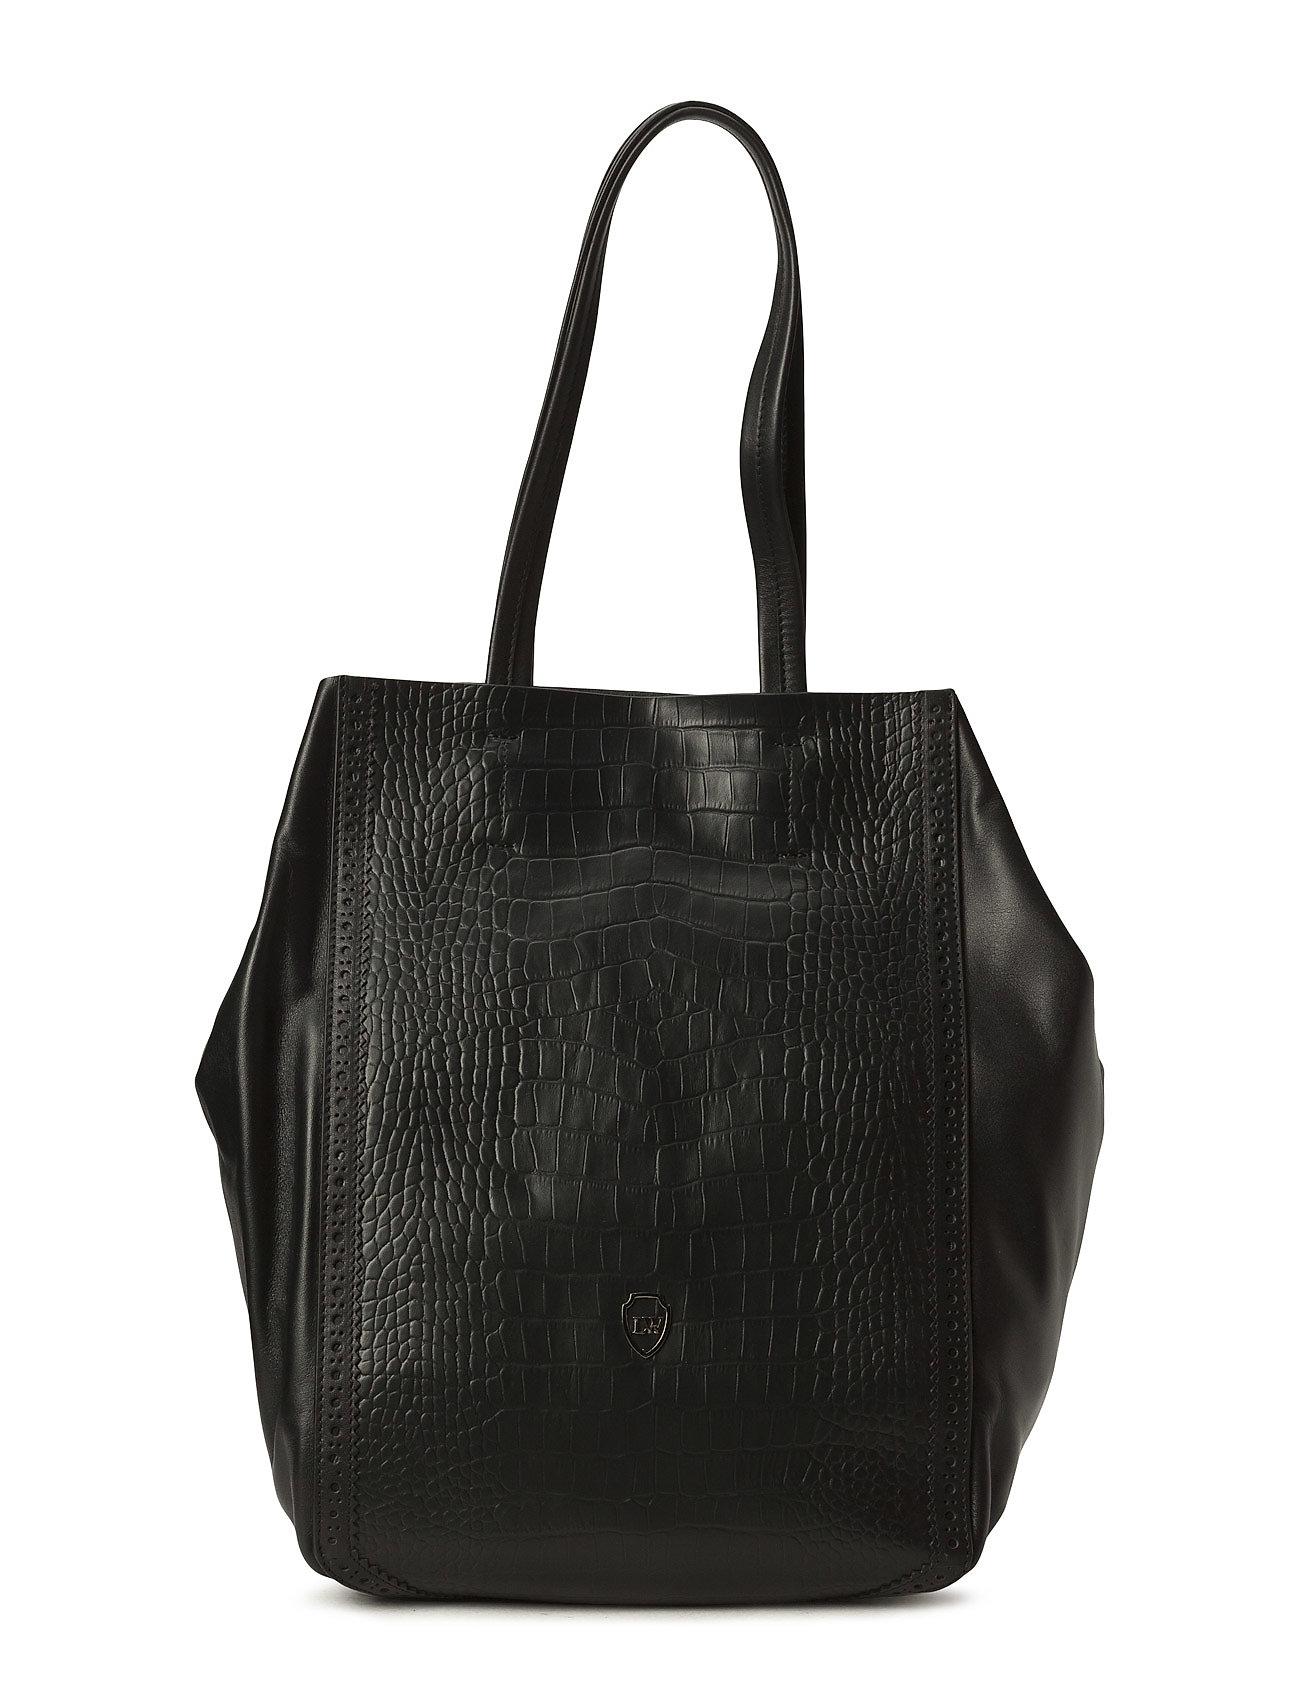 Leowulff Bonnie bag